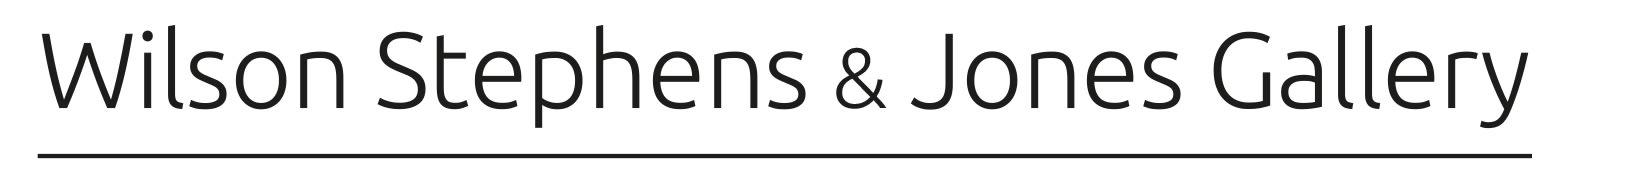 WSJ Gallery company logo